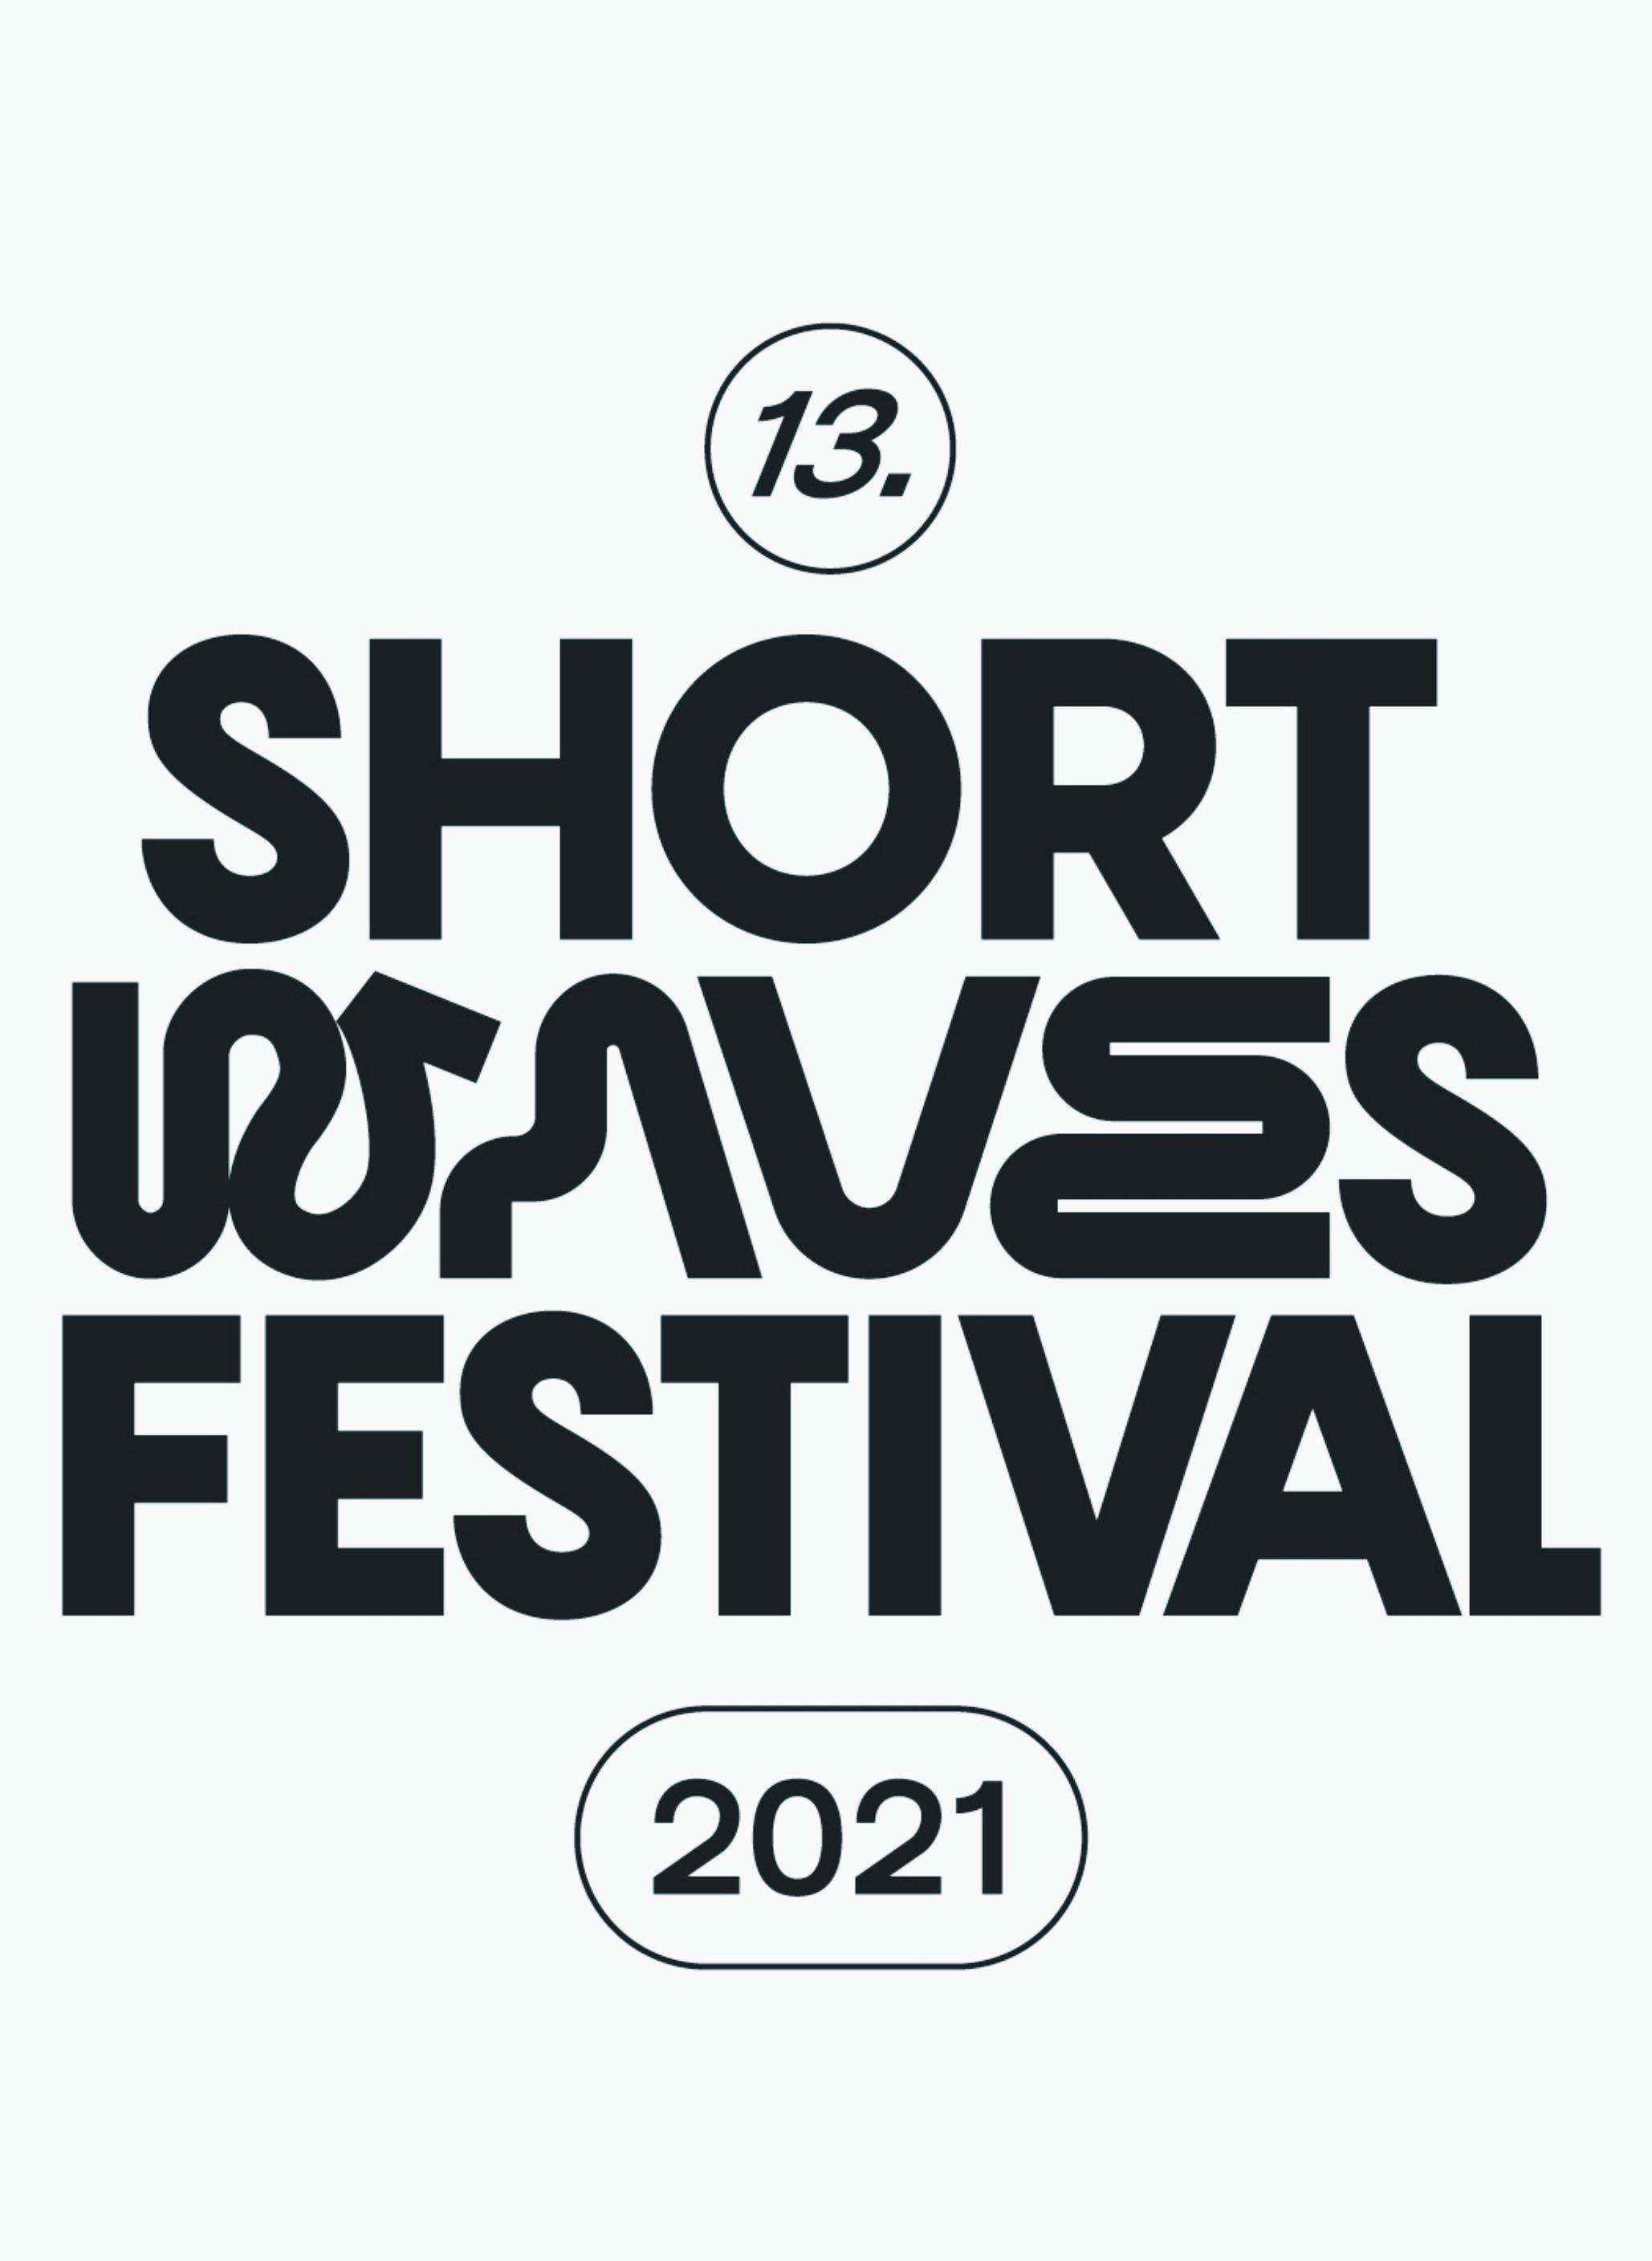 Short Waves Festival 2021 - International Competition V: Show me the way / Wskaż mi drogę